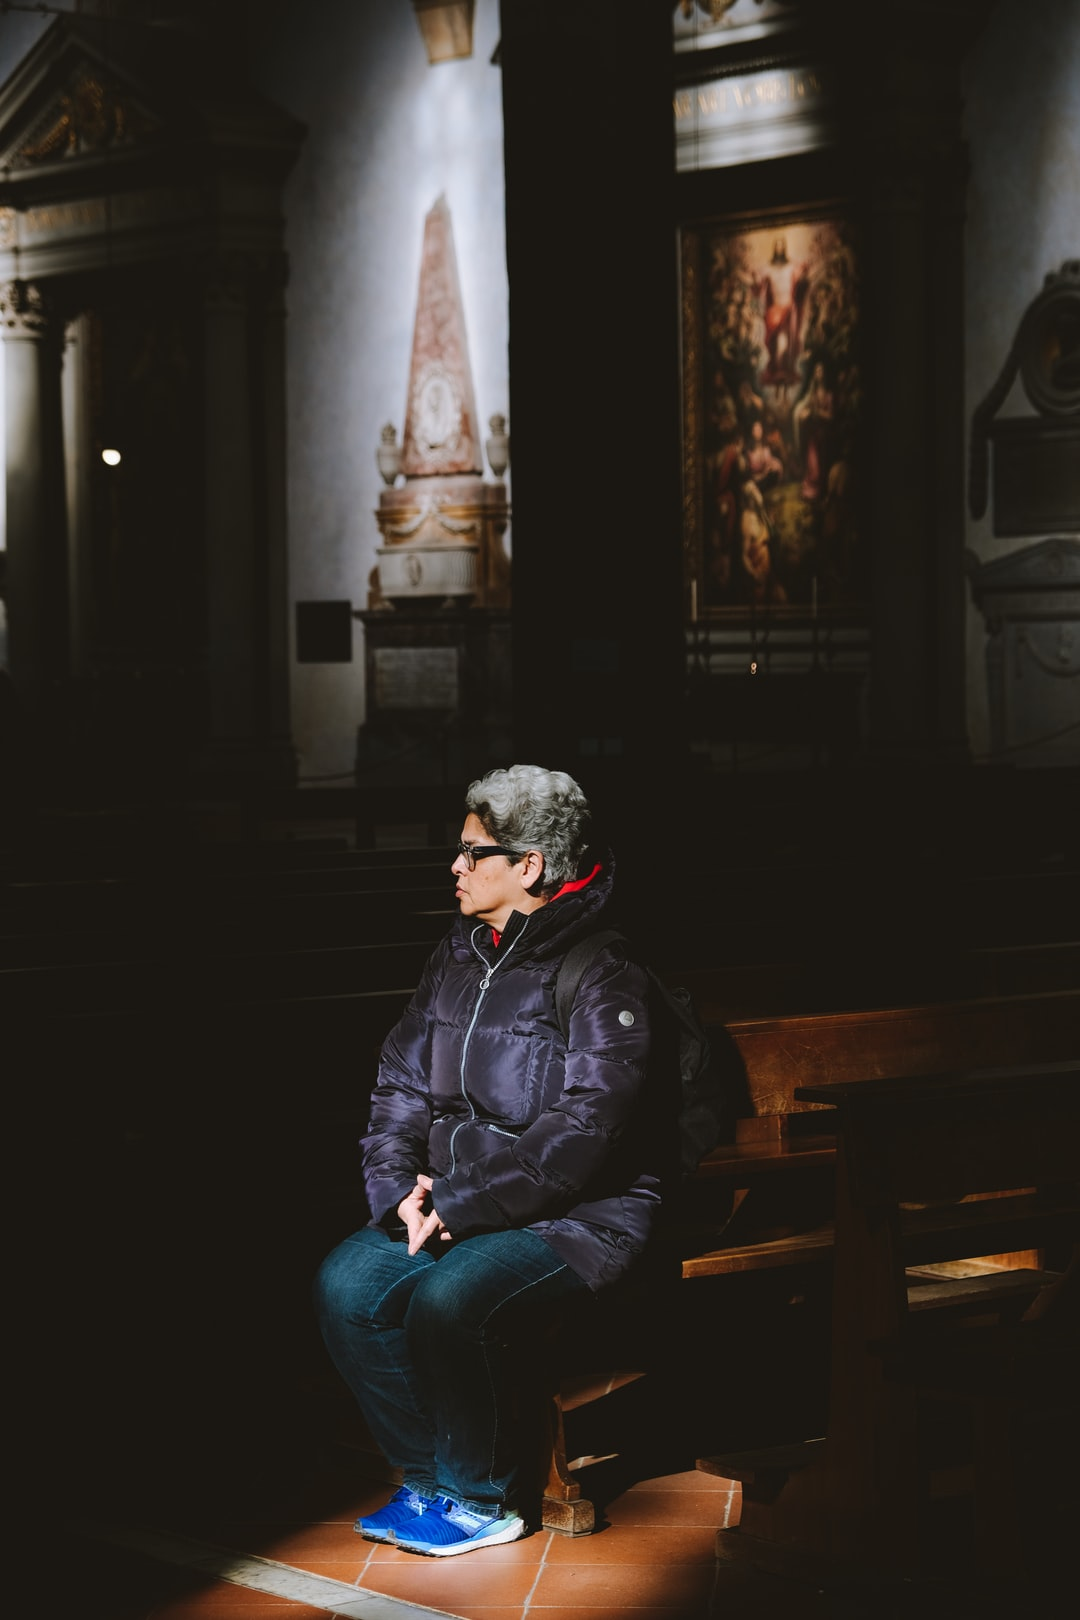 Meditating in a church.